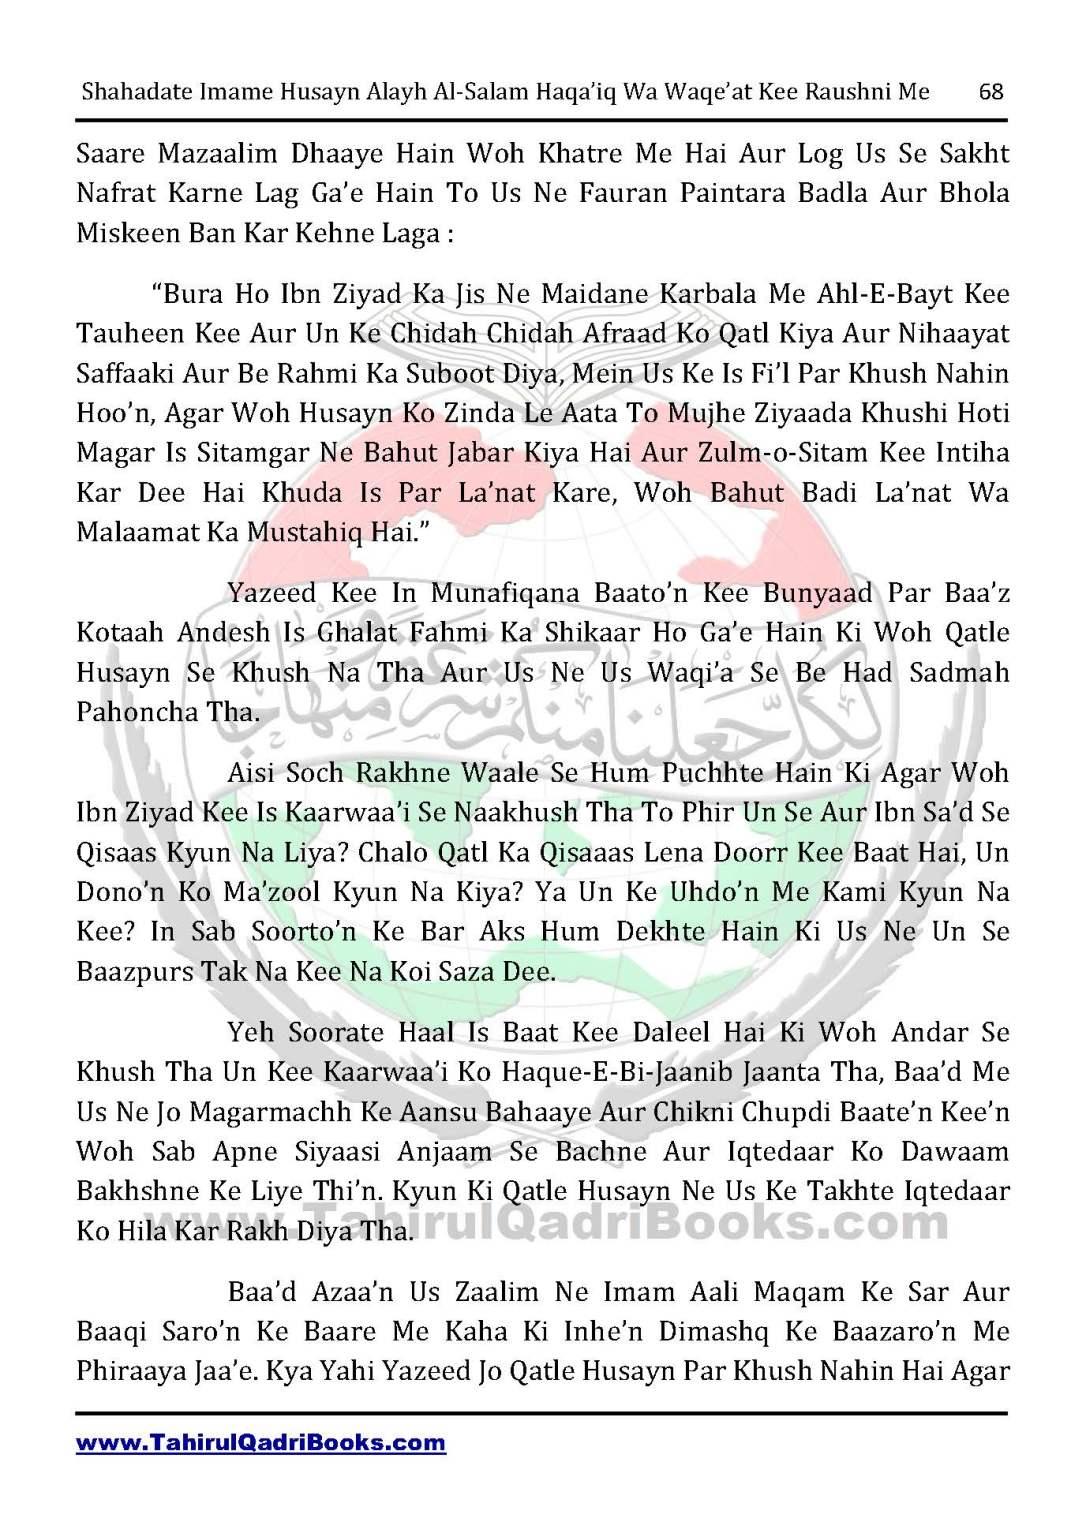 shahadate-imame-husayn-alayh-is-salam-haqaiq-wa-waqe_at-kee-raushni-me-in-roman-urdu-unlocked_Page_68